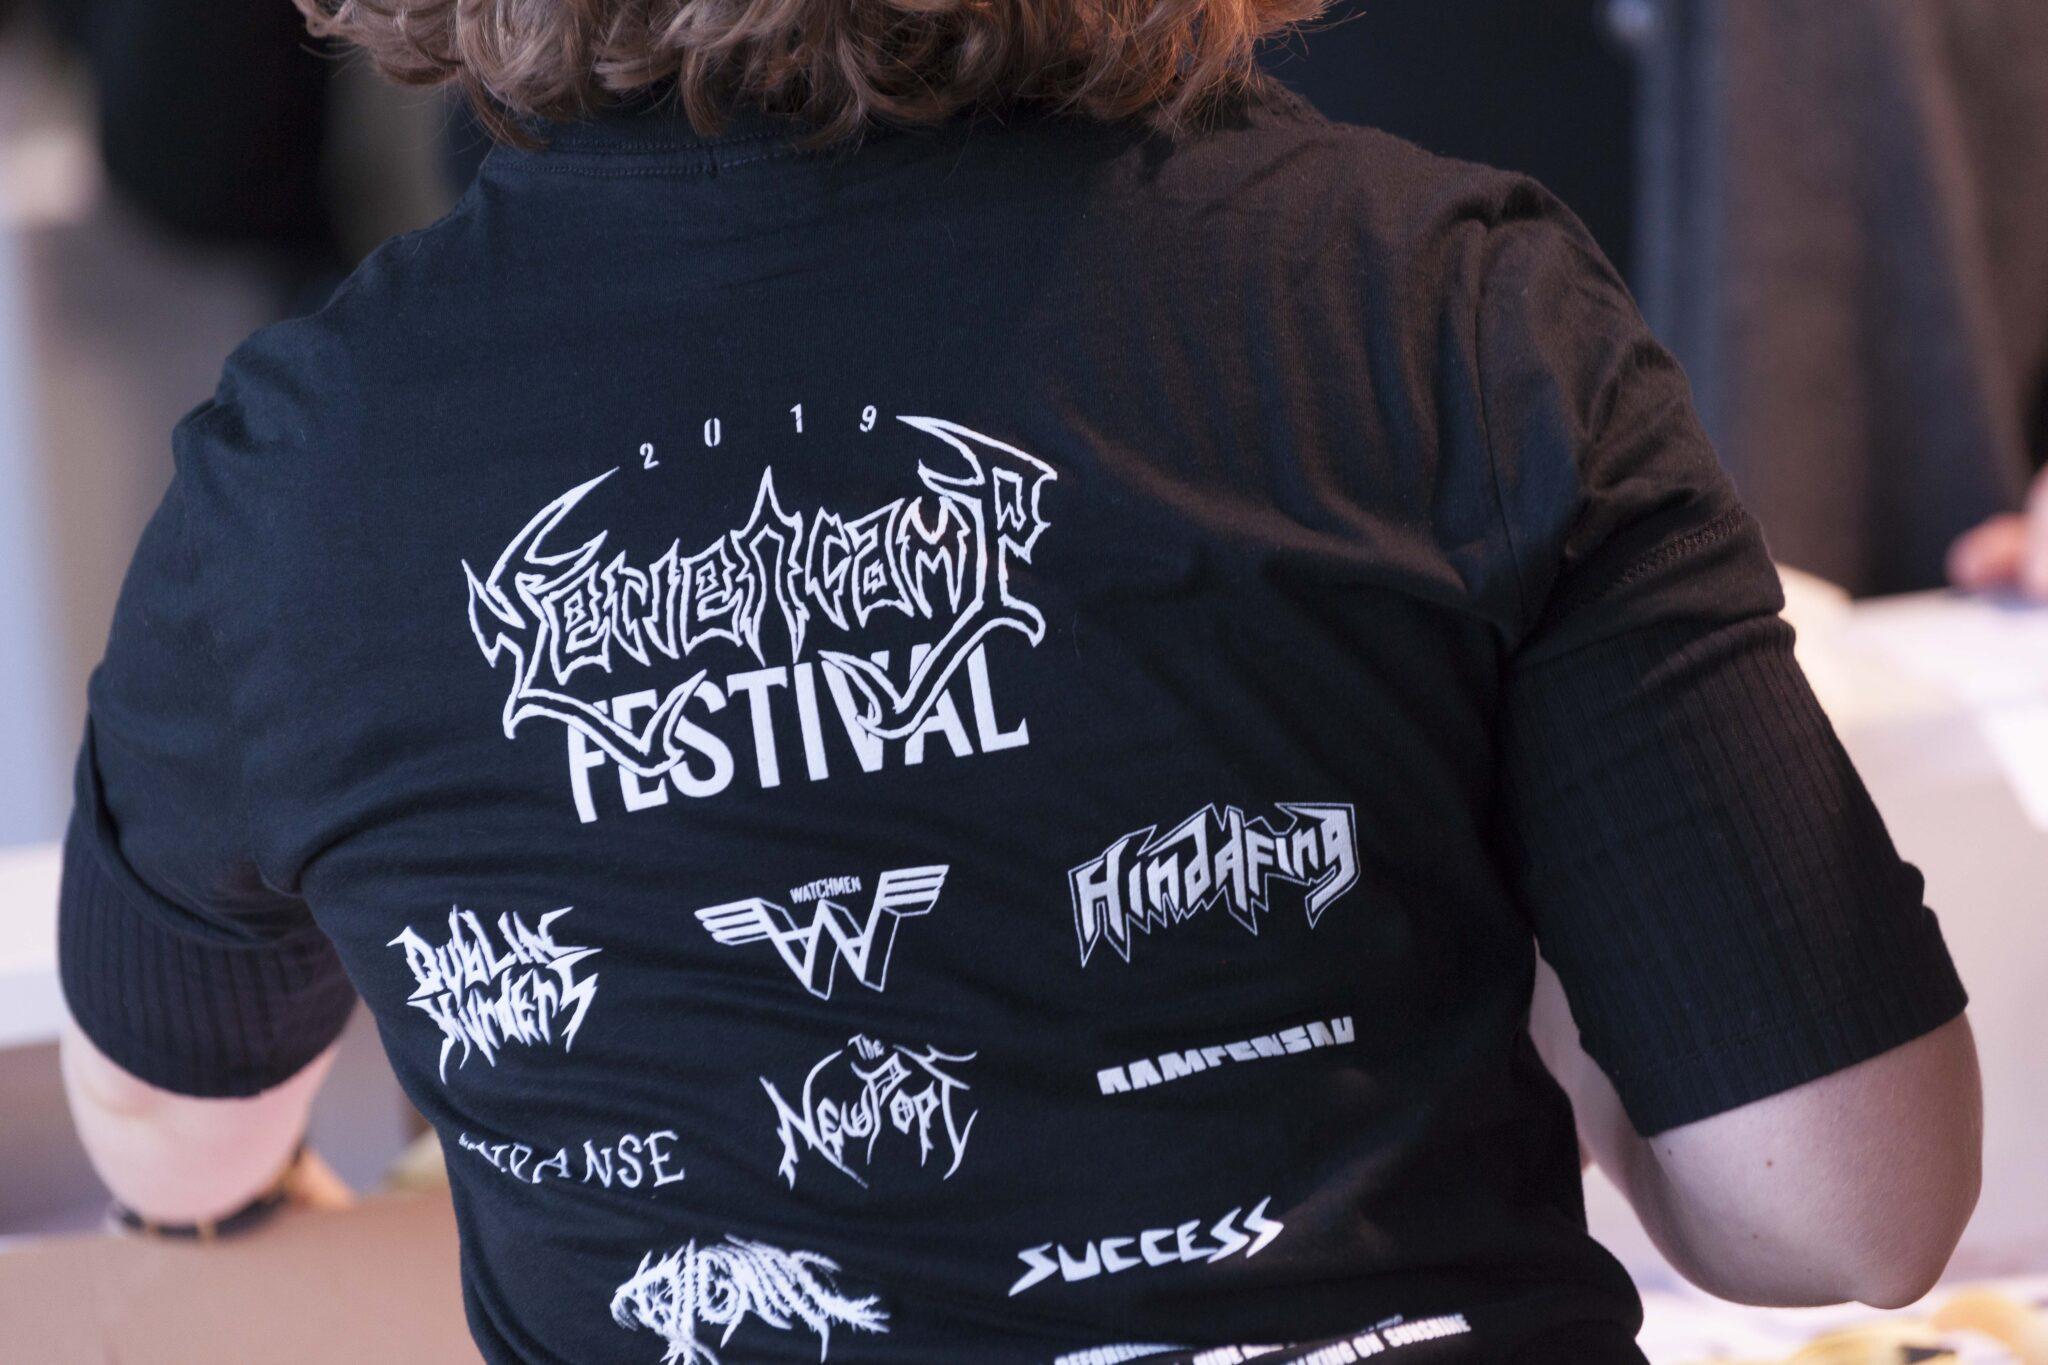 Seriencamp-Festival-11